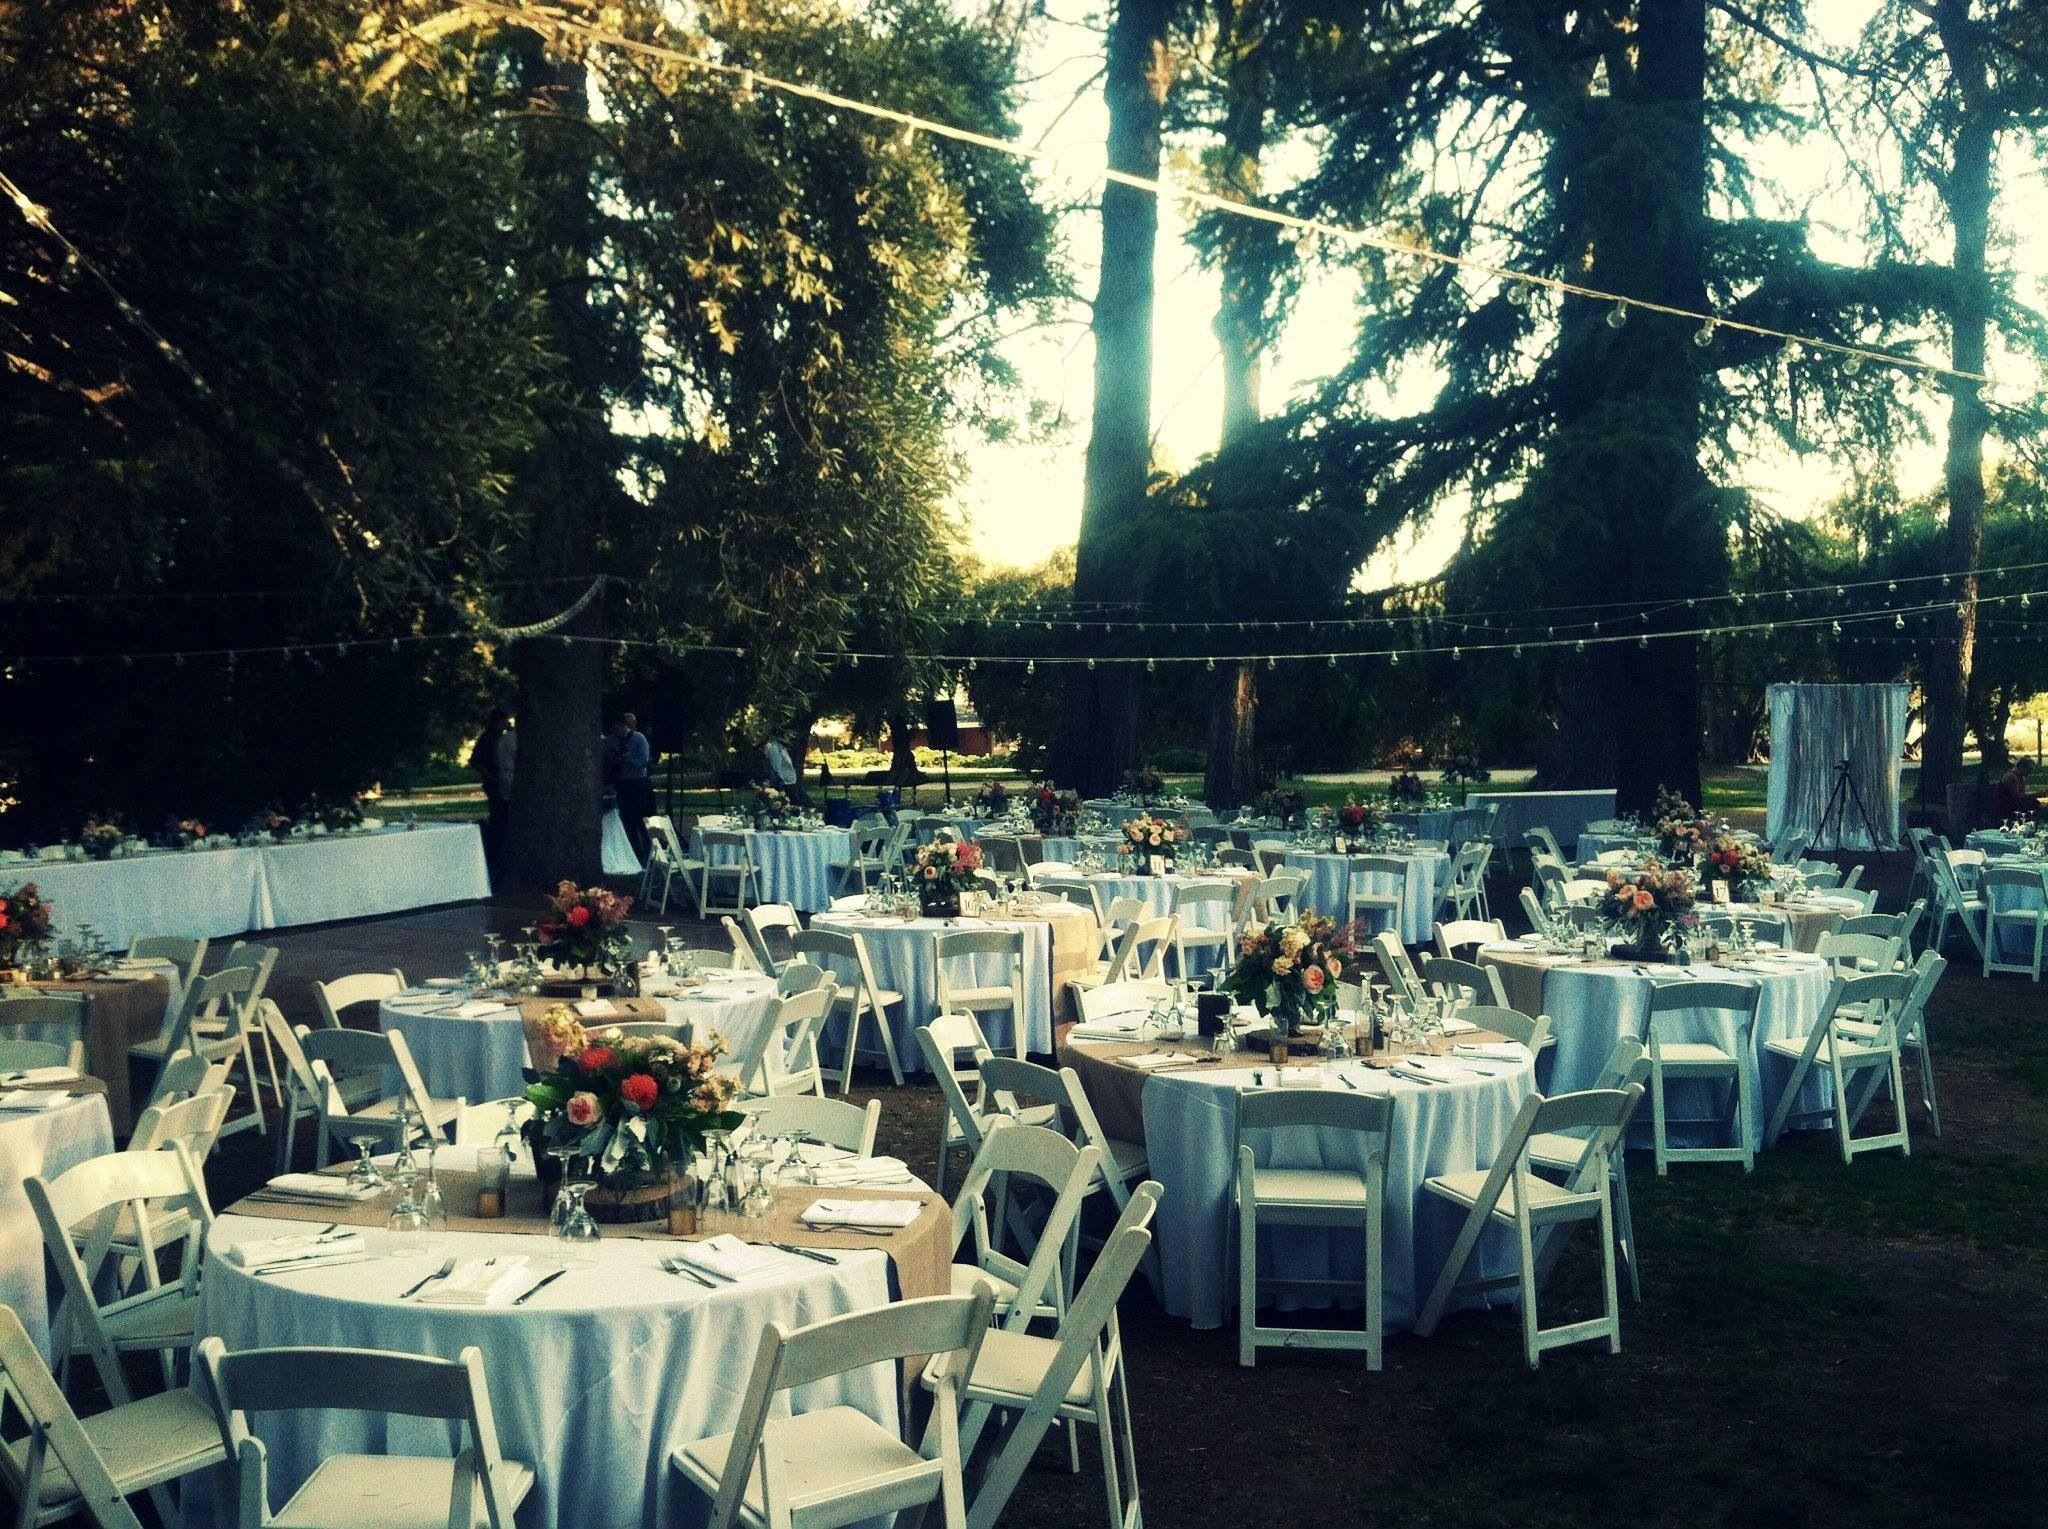 Outside garden wedding in blush tones